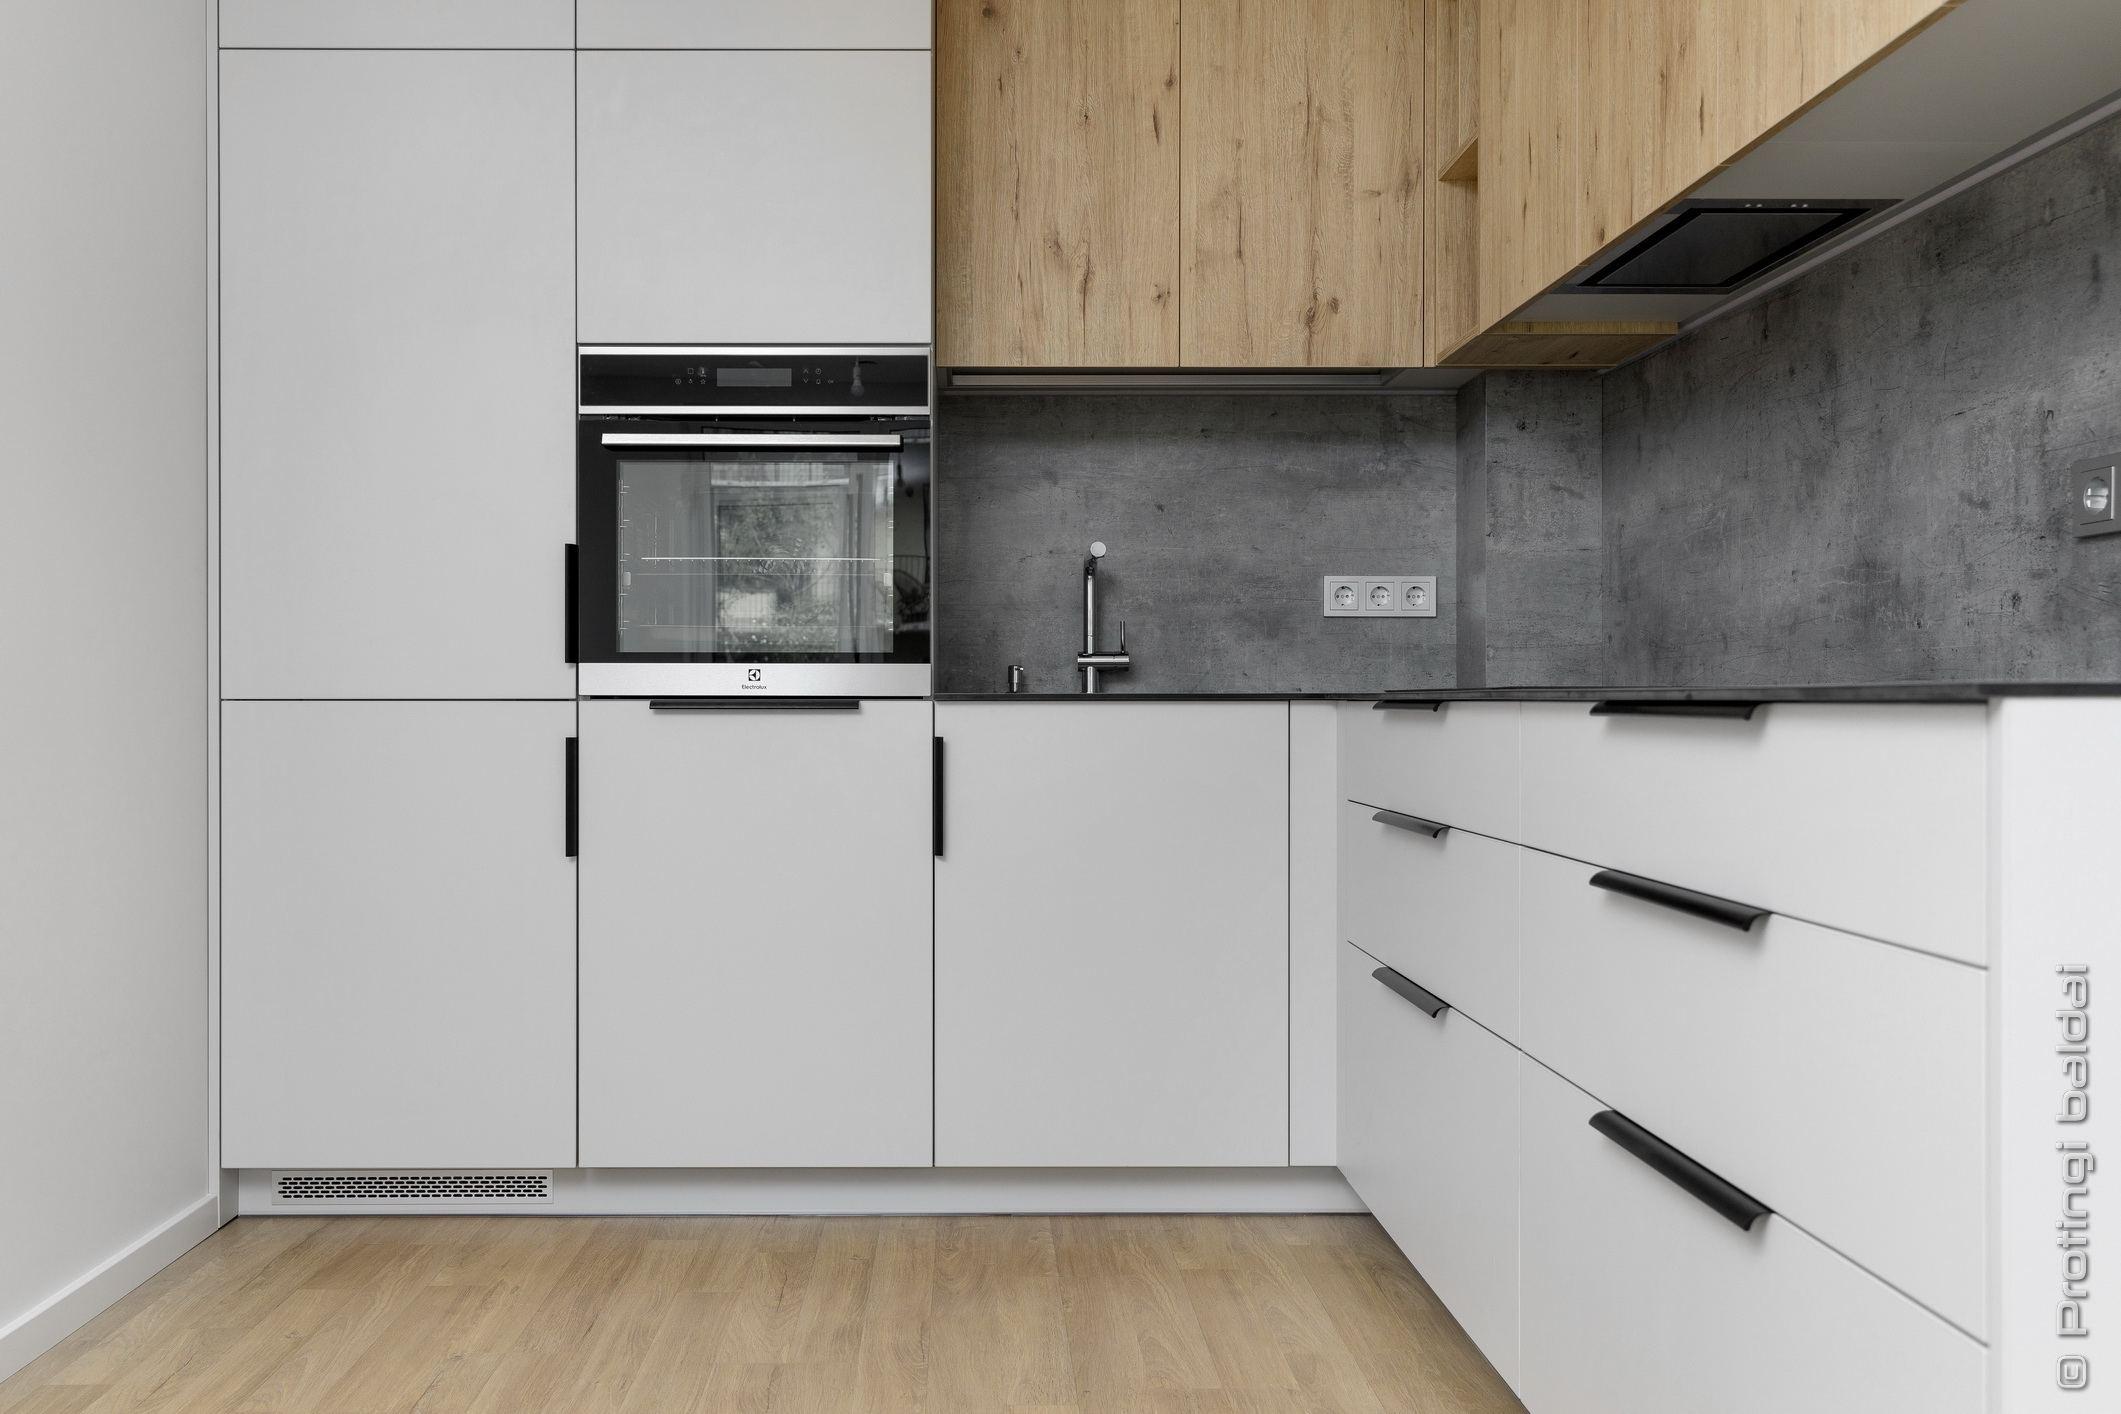 virtuves_baldai_PB29-14